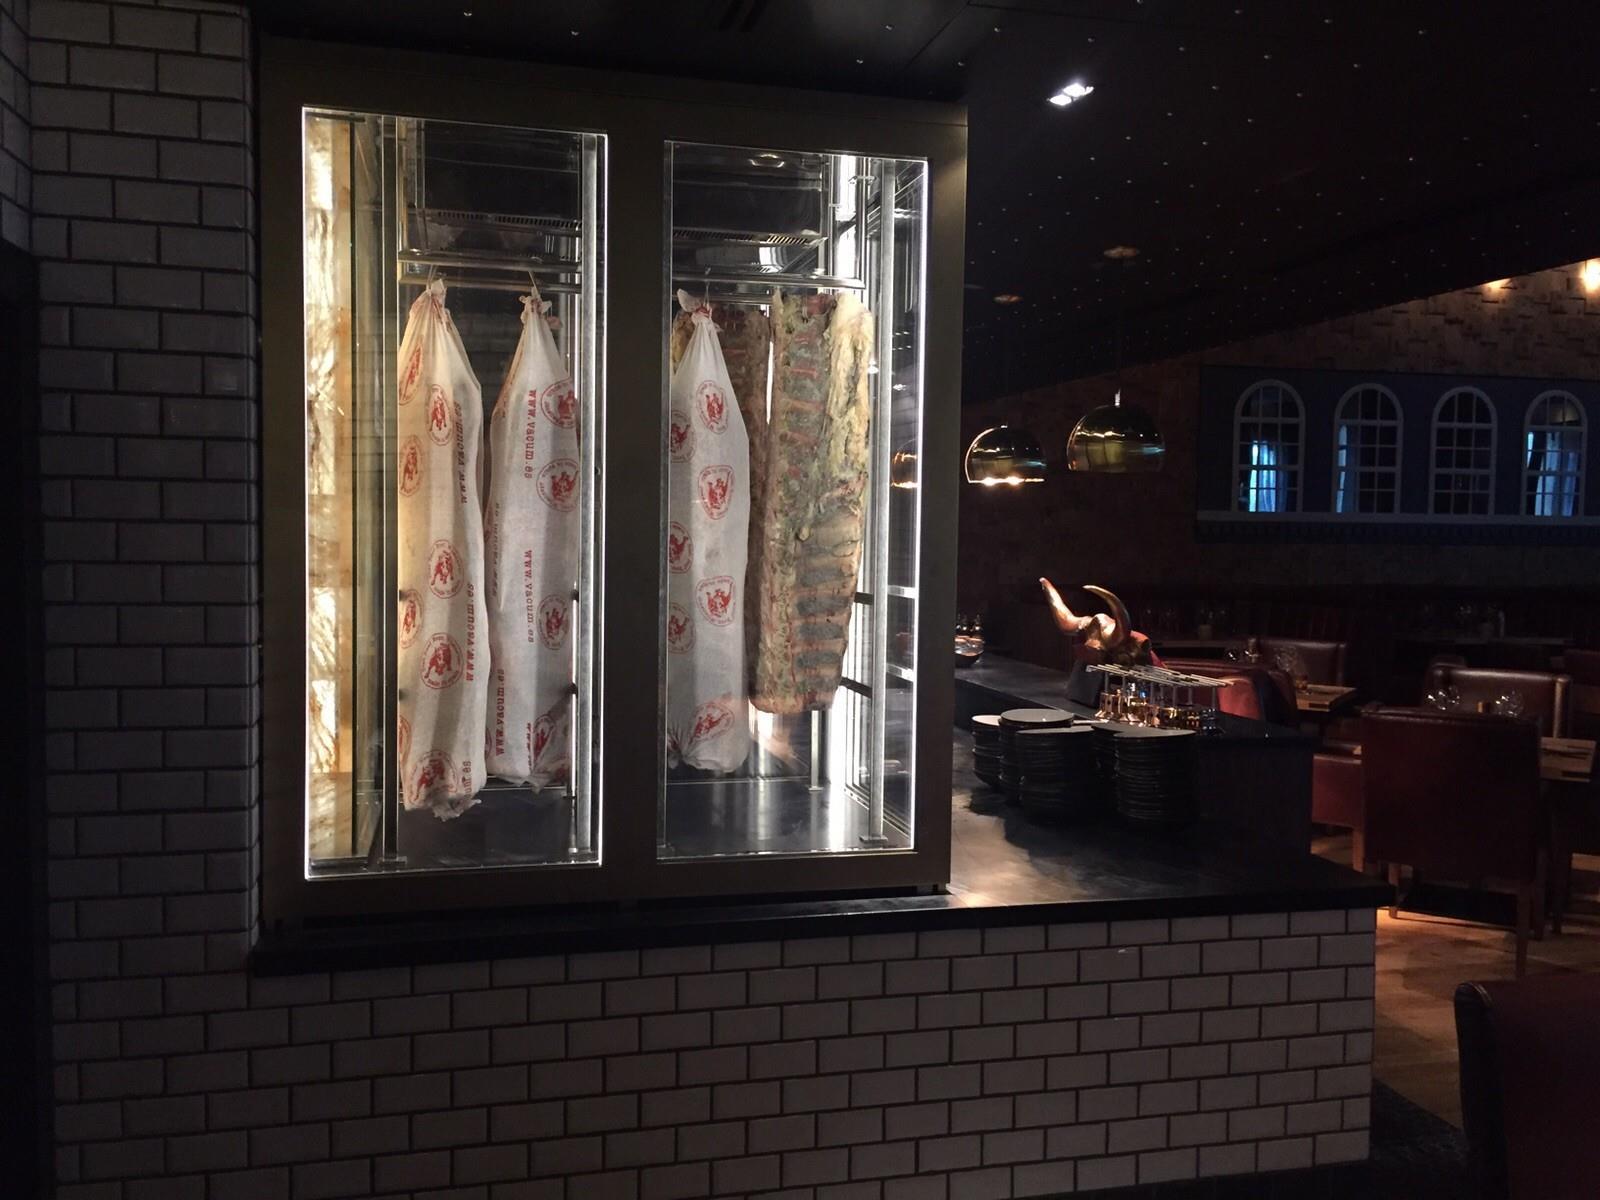 meat-display-refrigerator-cabinet